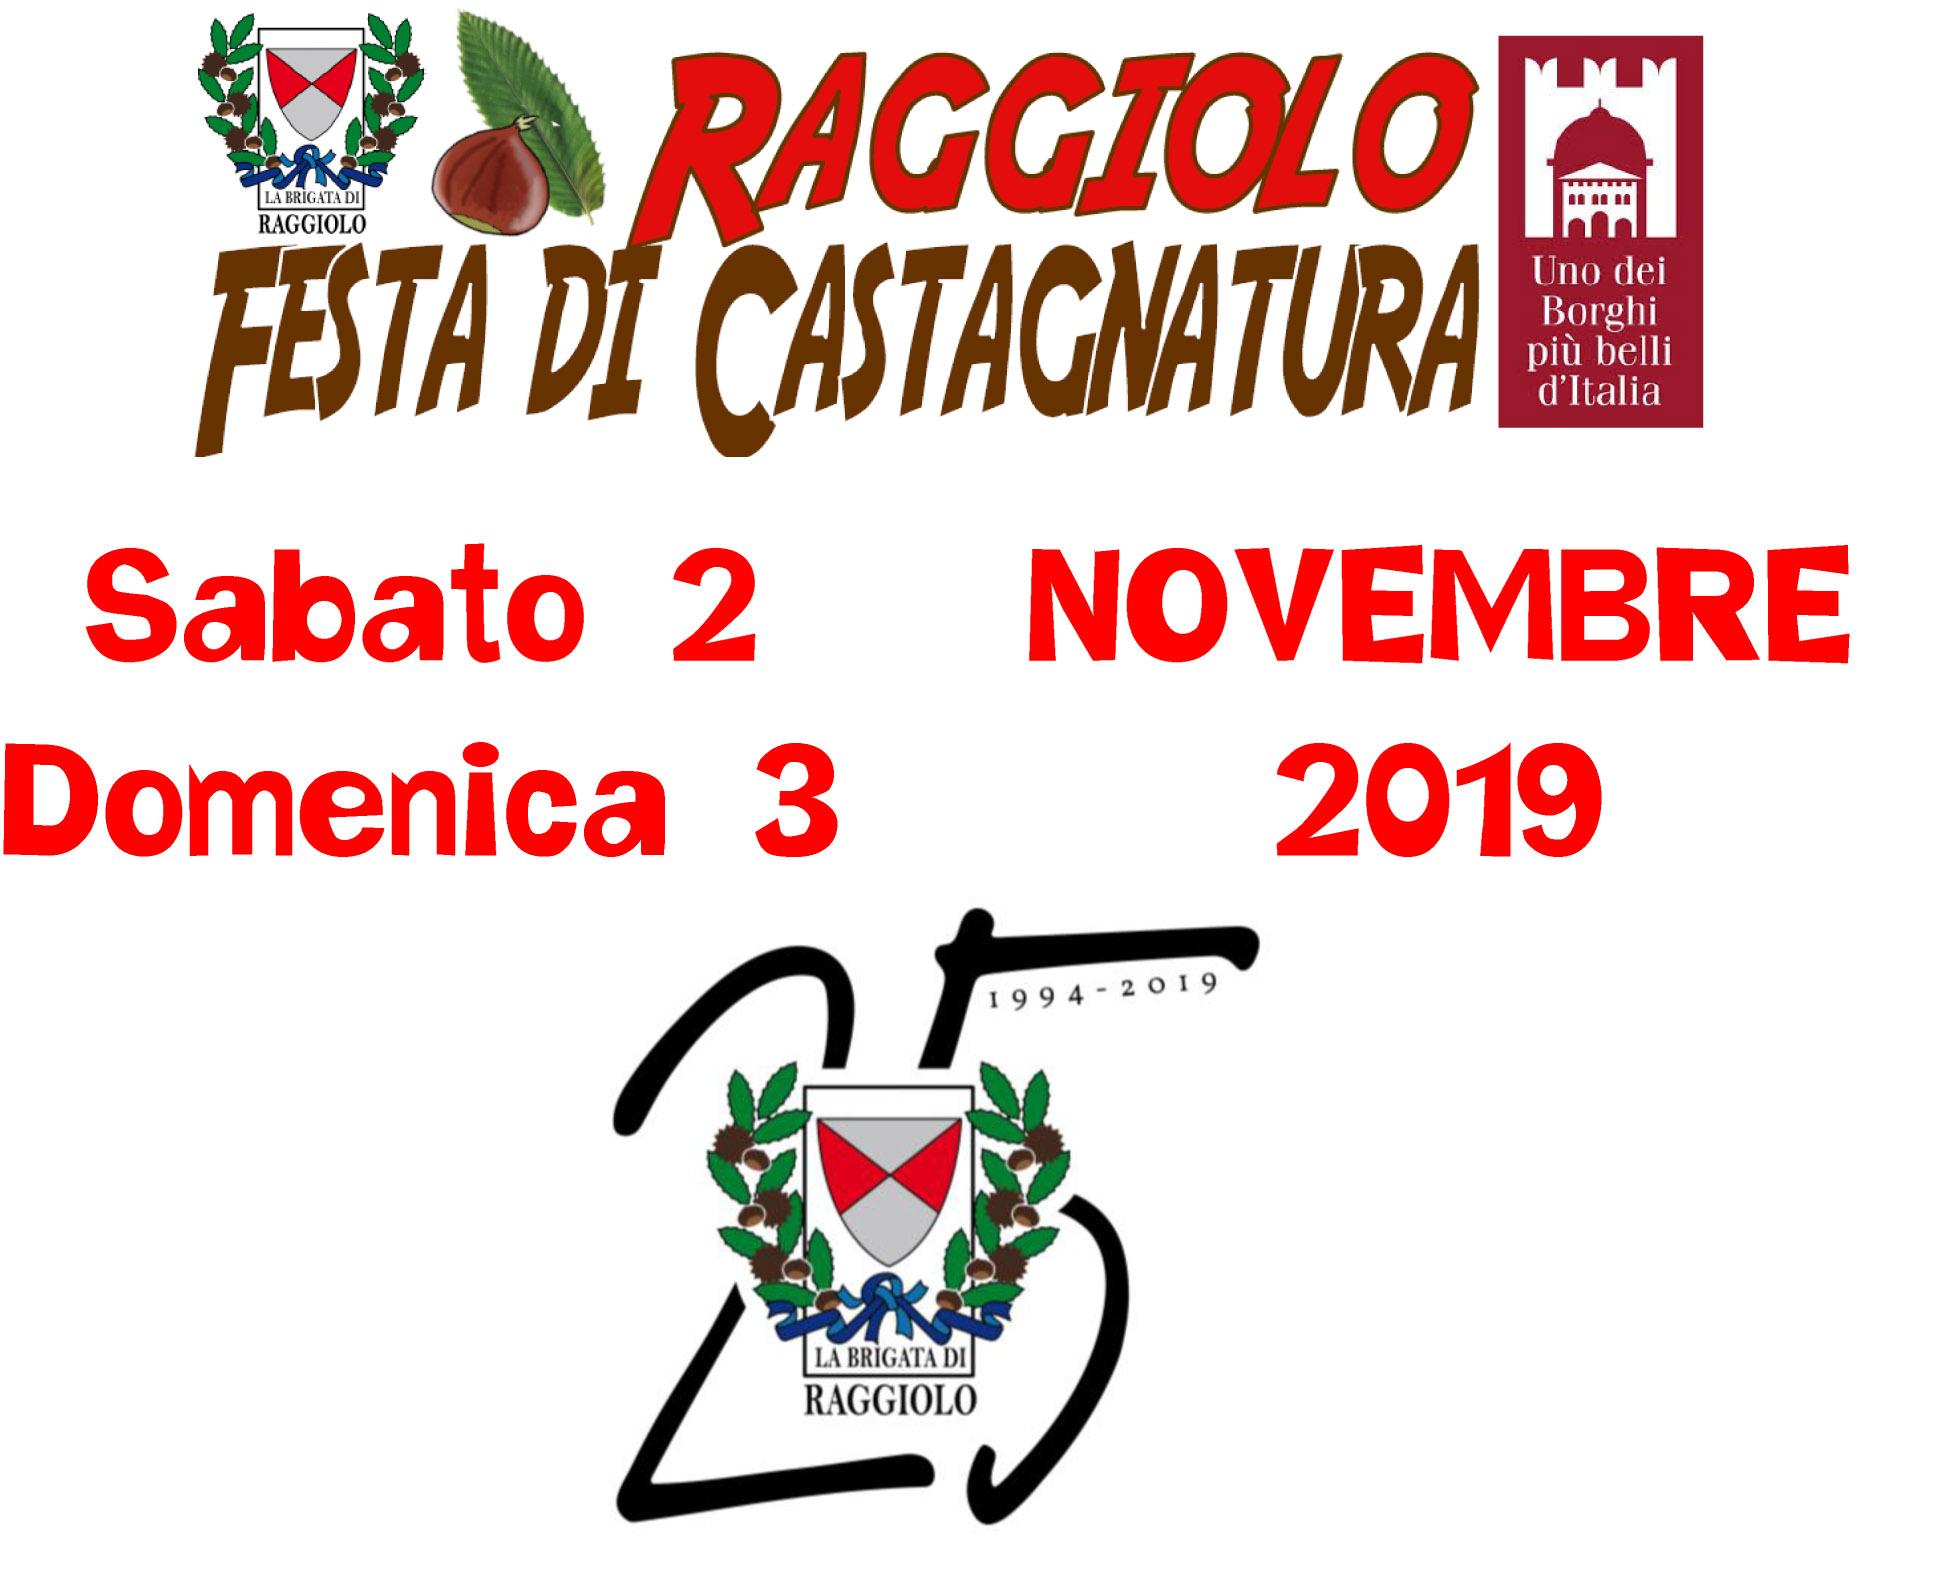 FESTA DI CASTAGNATURA 2019